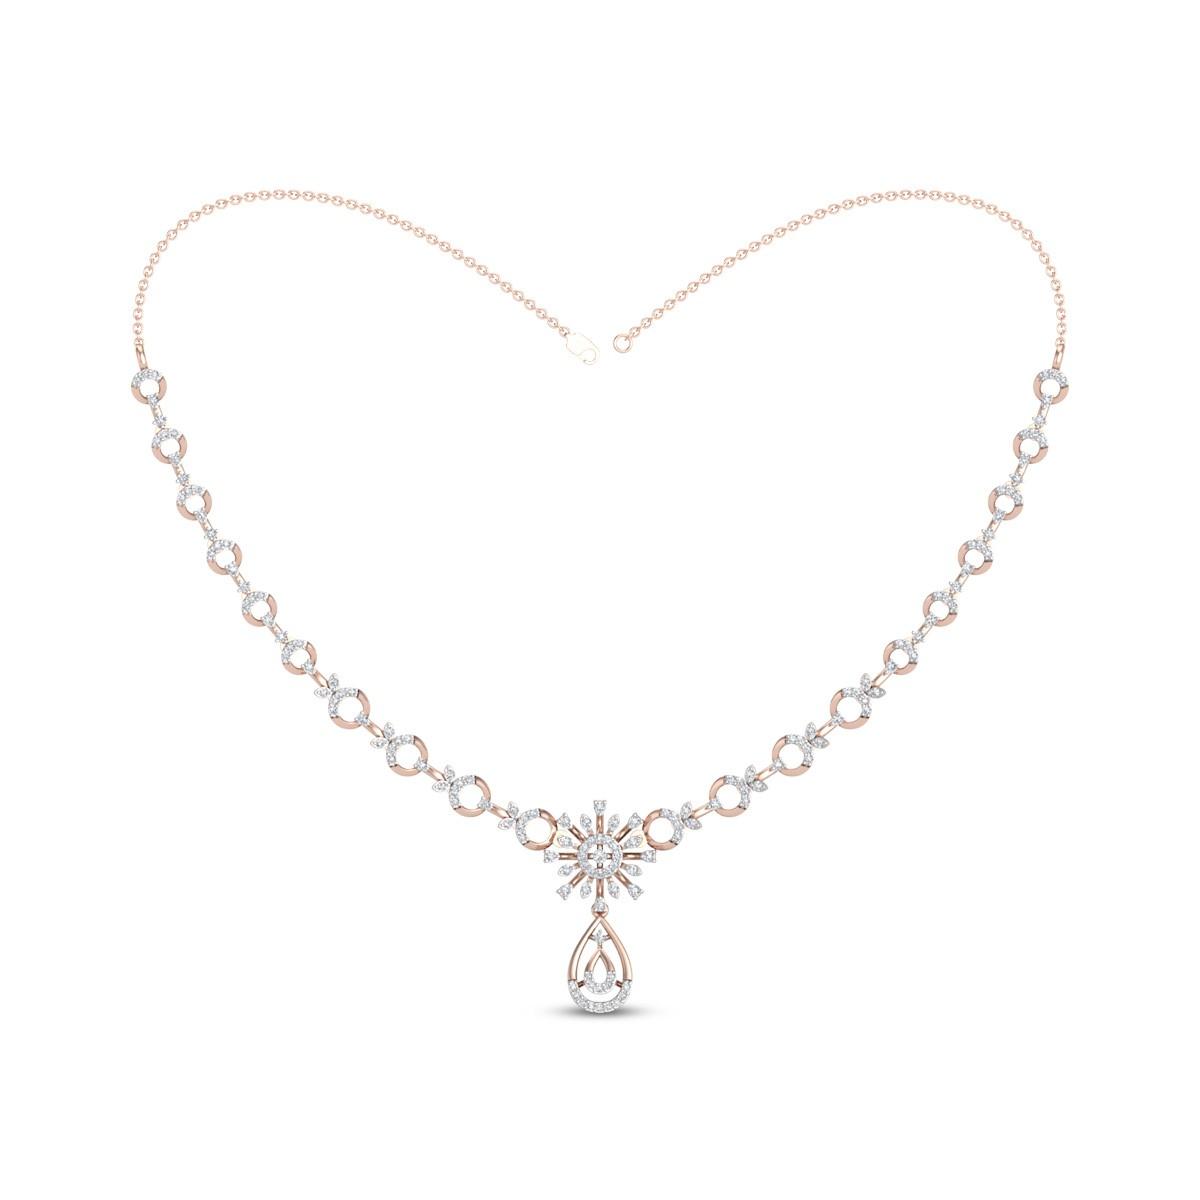 Diamond Necklace DJNC5097